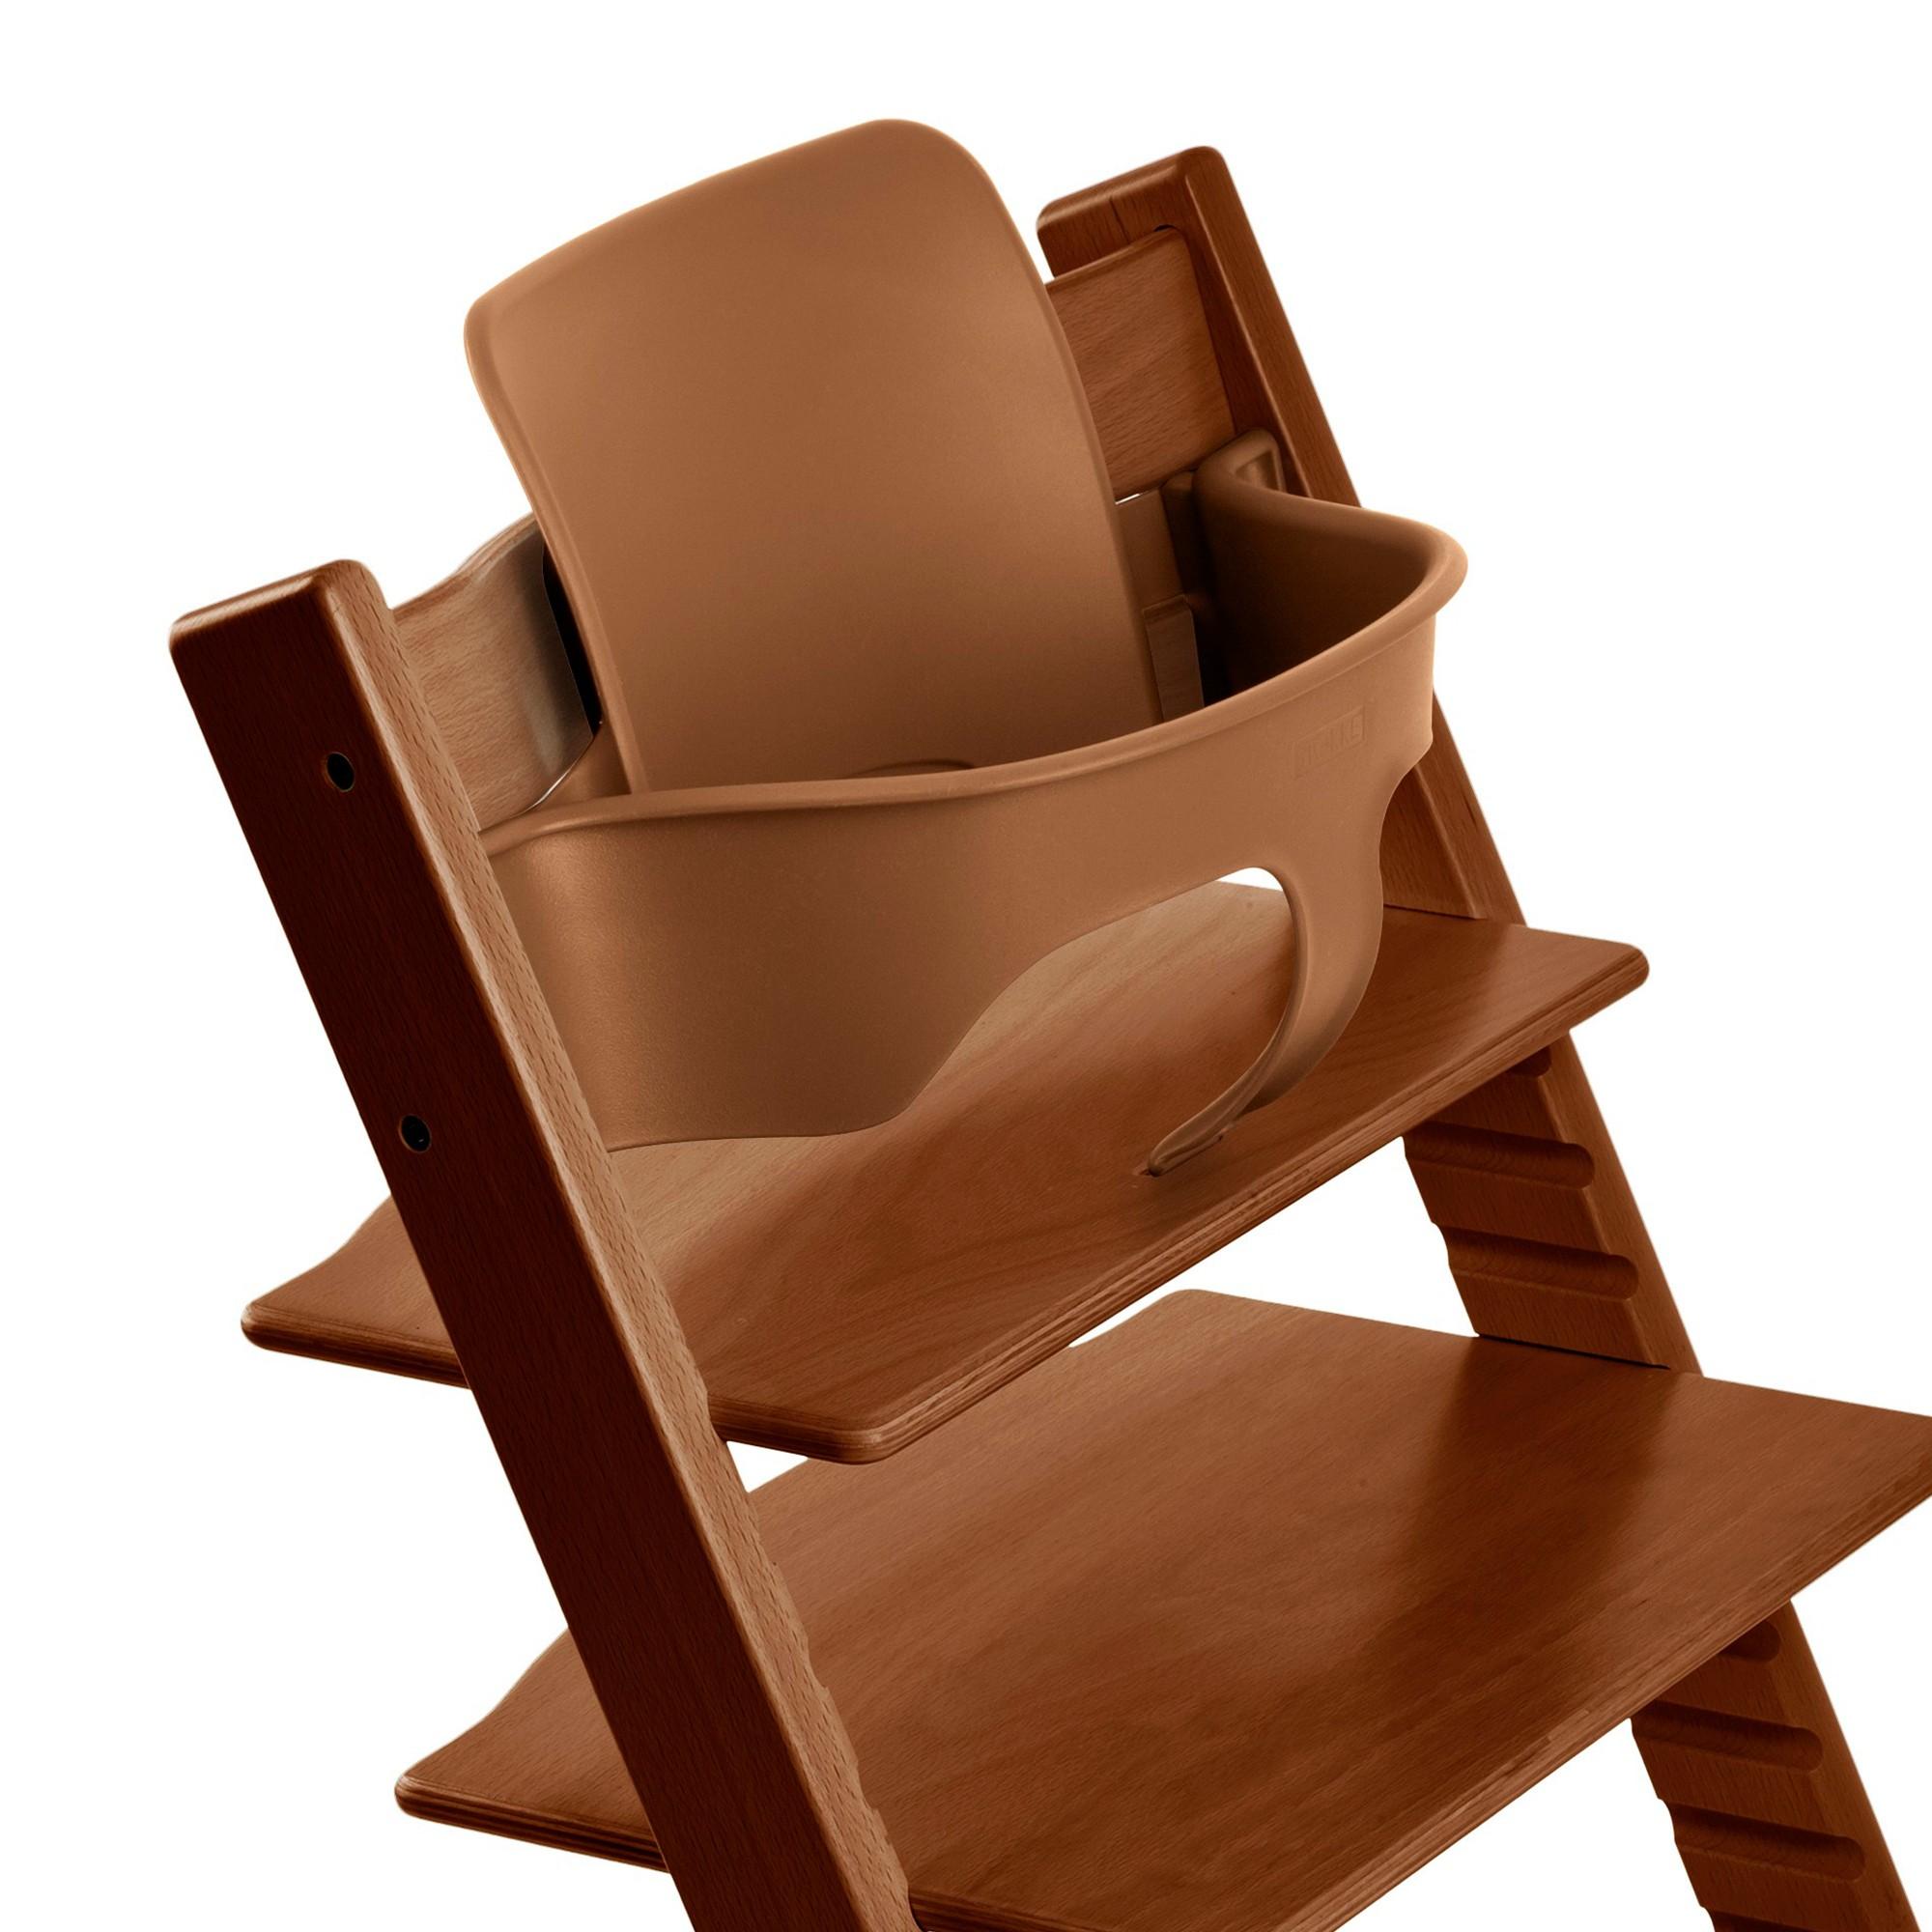 Stokke Tripp Trapp Baby Set High Chair Accessories - Walnut (Brown ...